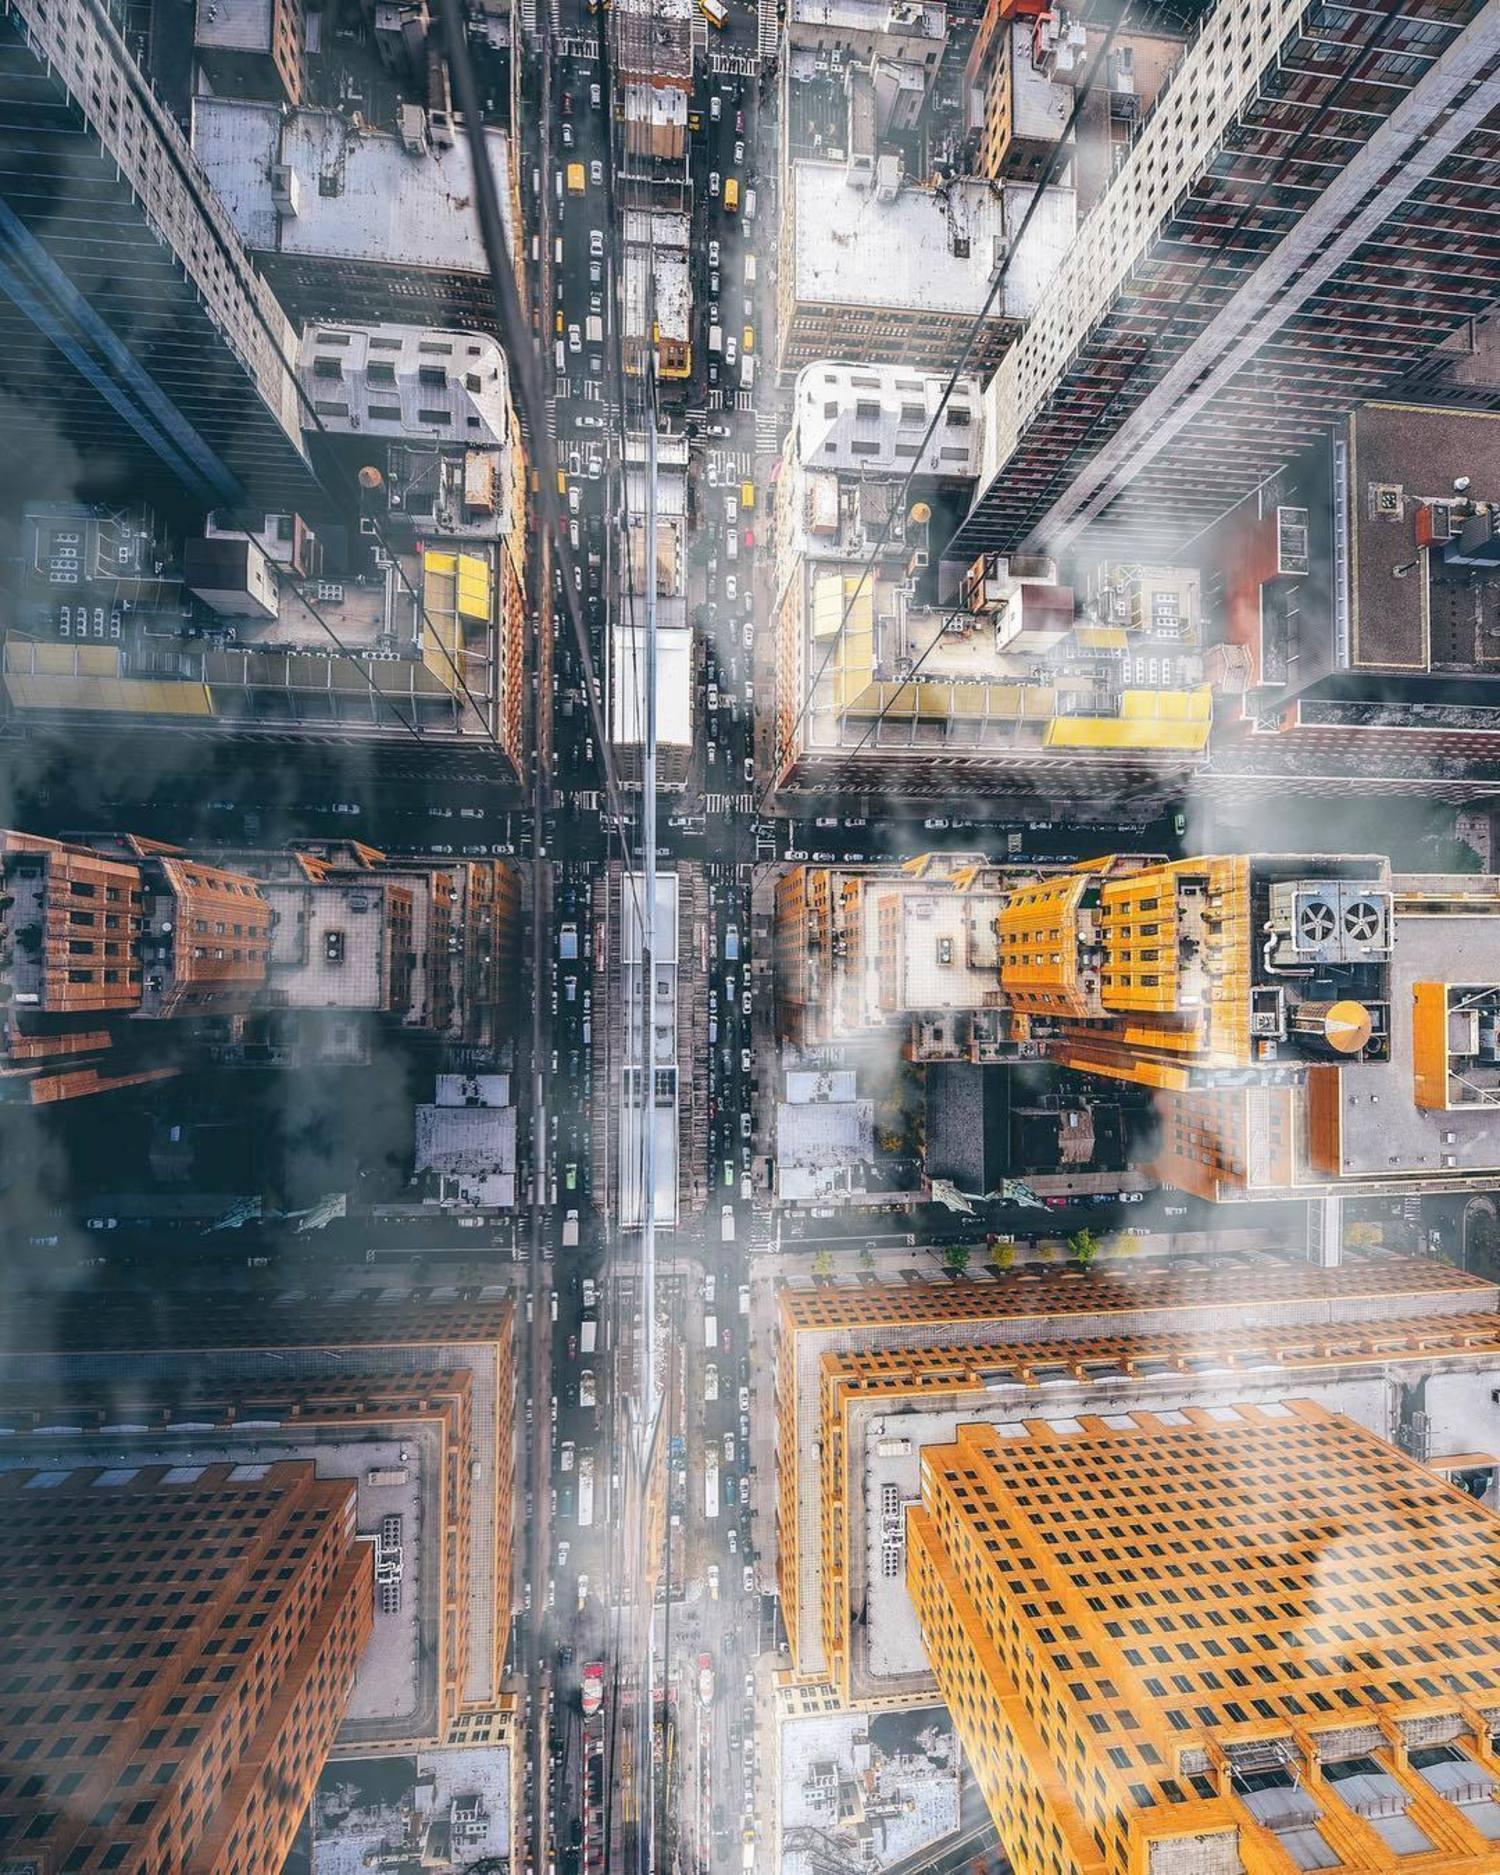 New York, New York. 📸 via @quanatl #viewingnyc #nyc #newyorkcity #newyork